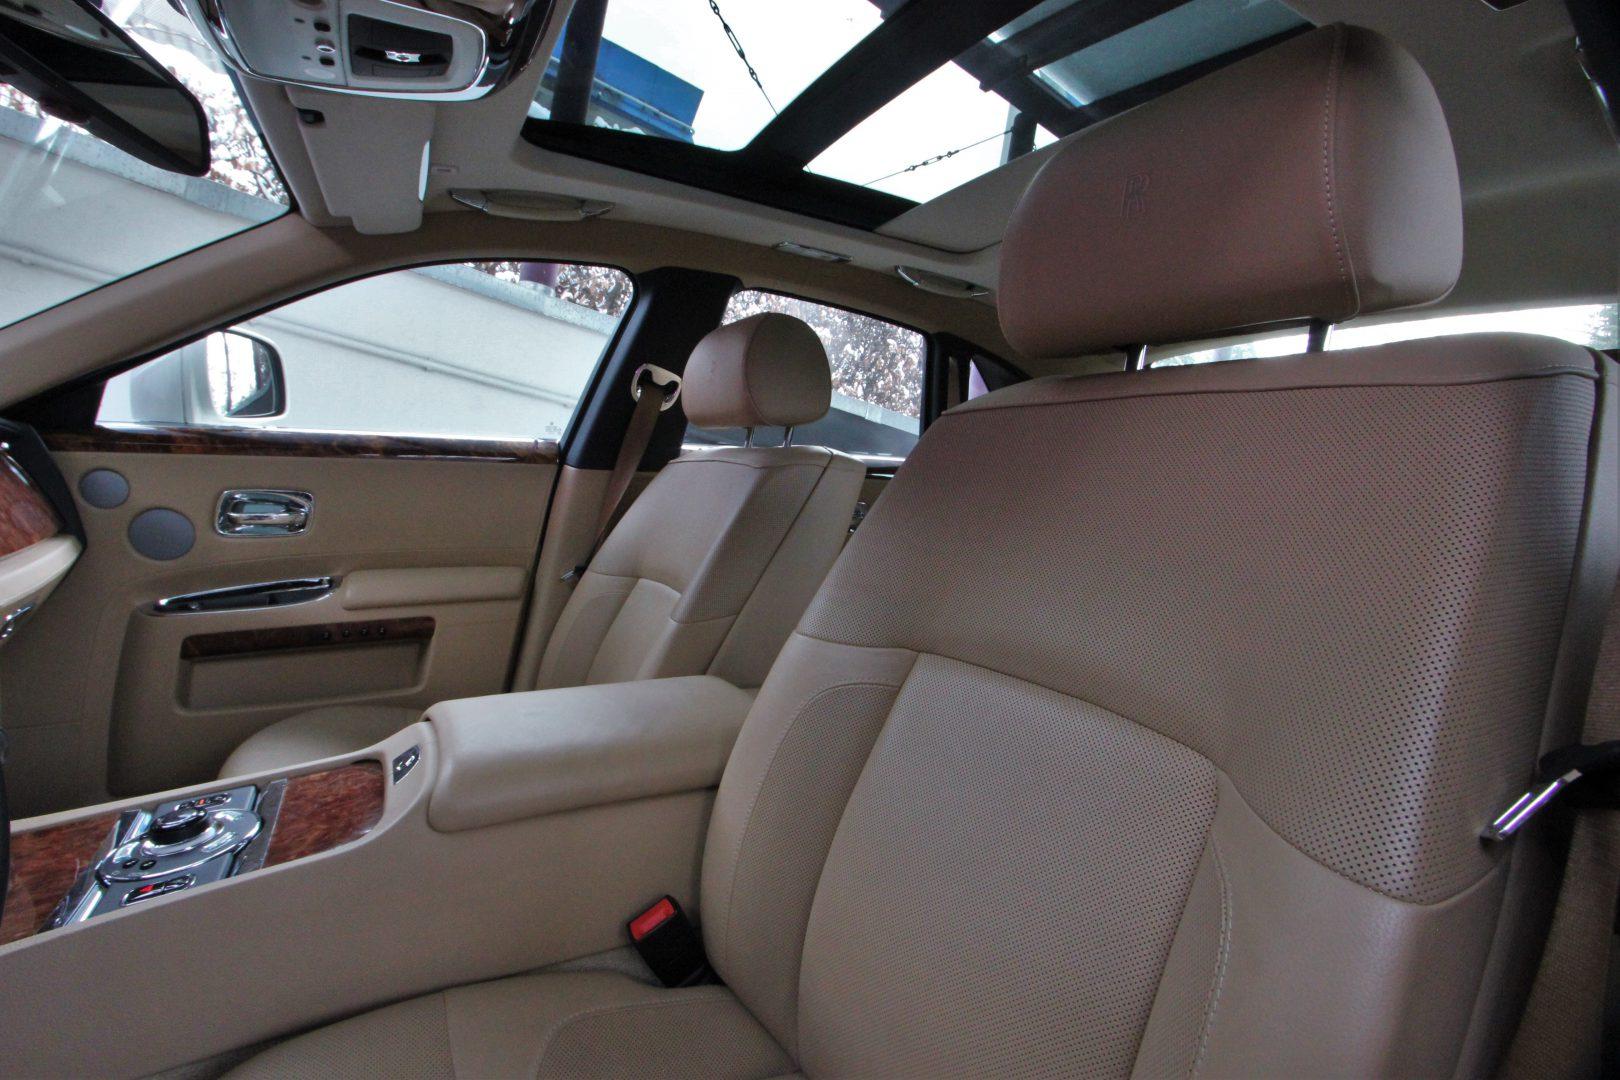 AIL Rolls Royce Ghost 6.6 V12  5